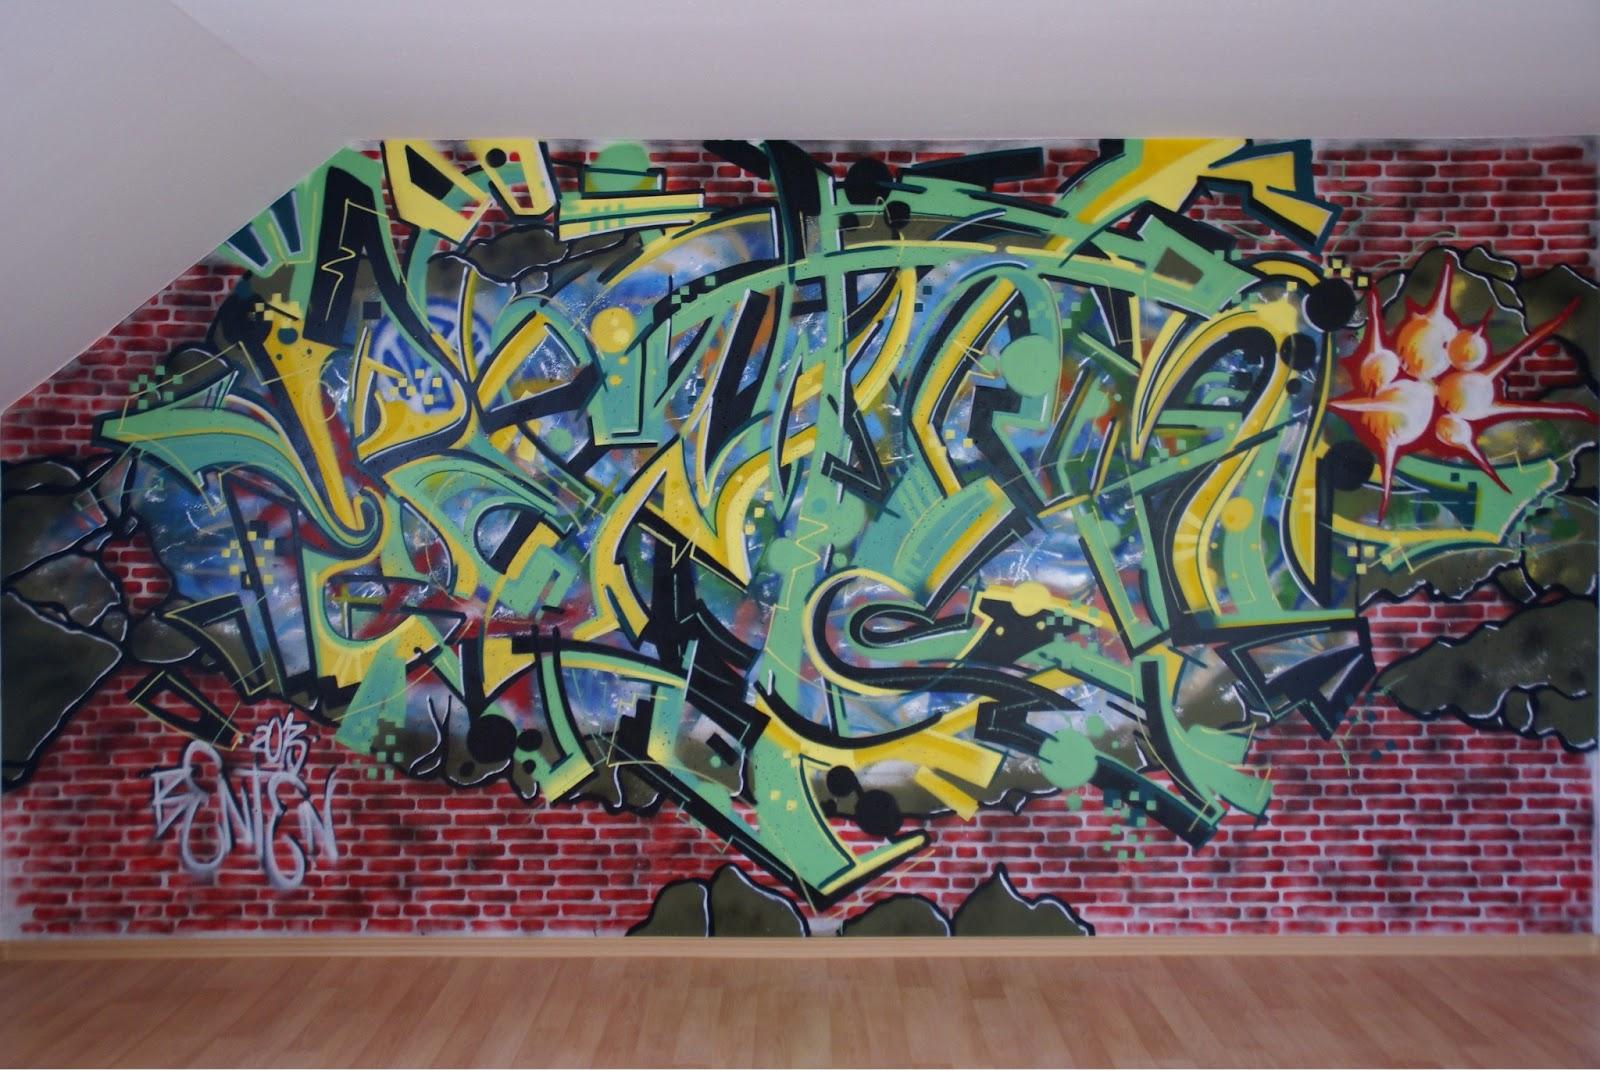 benten graffiti 2013 2 | friedrich benten benzler graffiti, tattoo, Hause deko